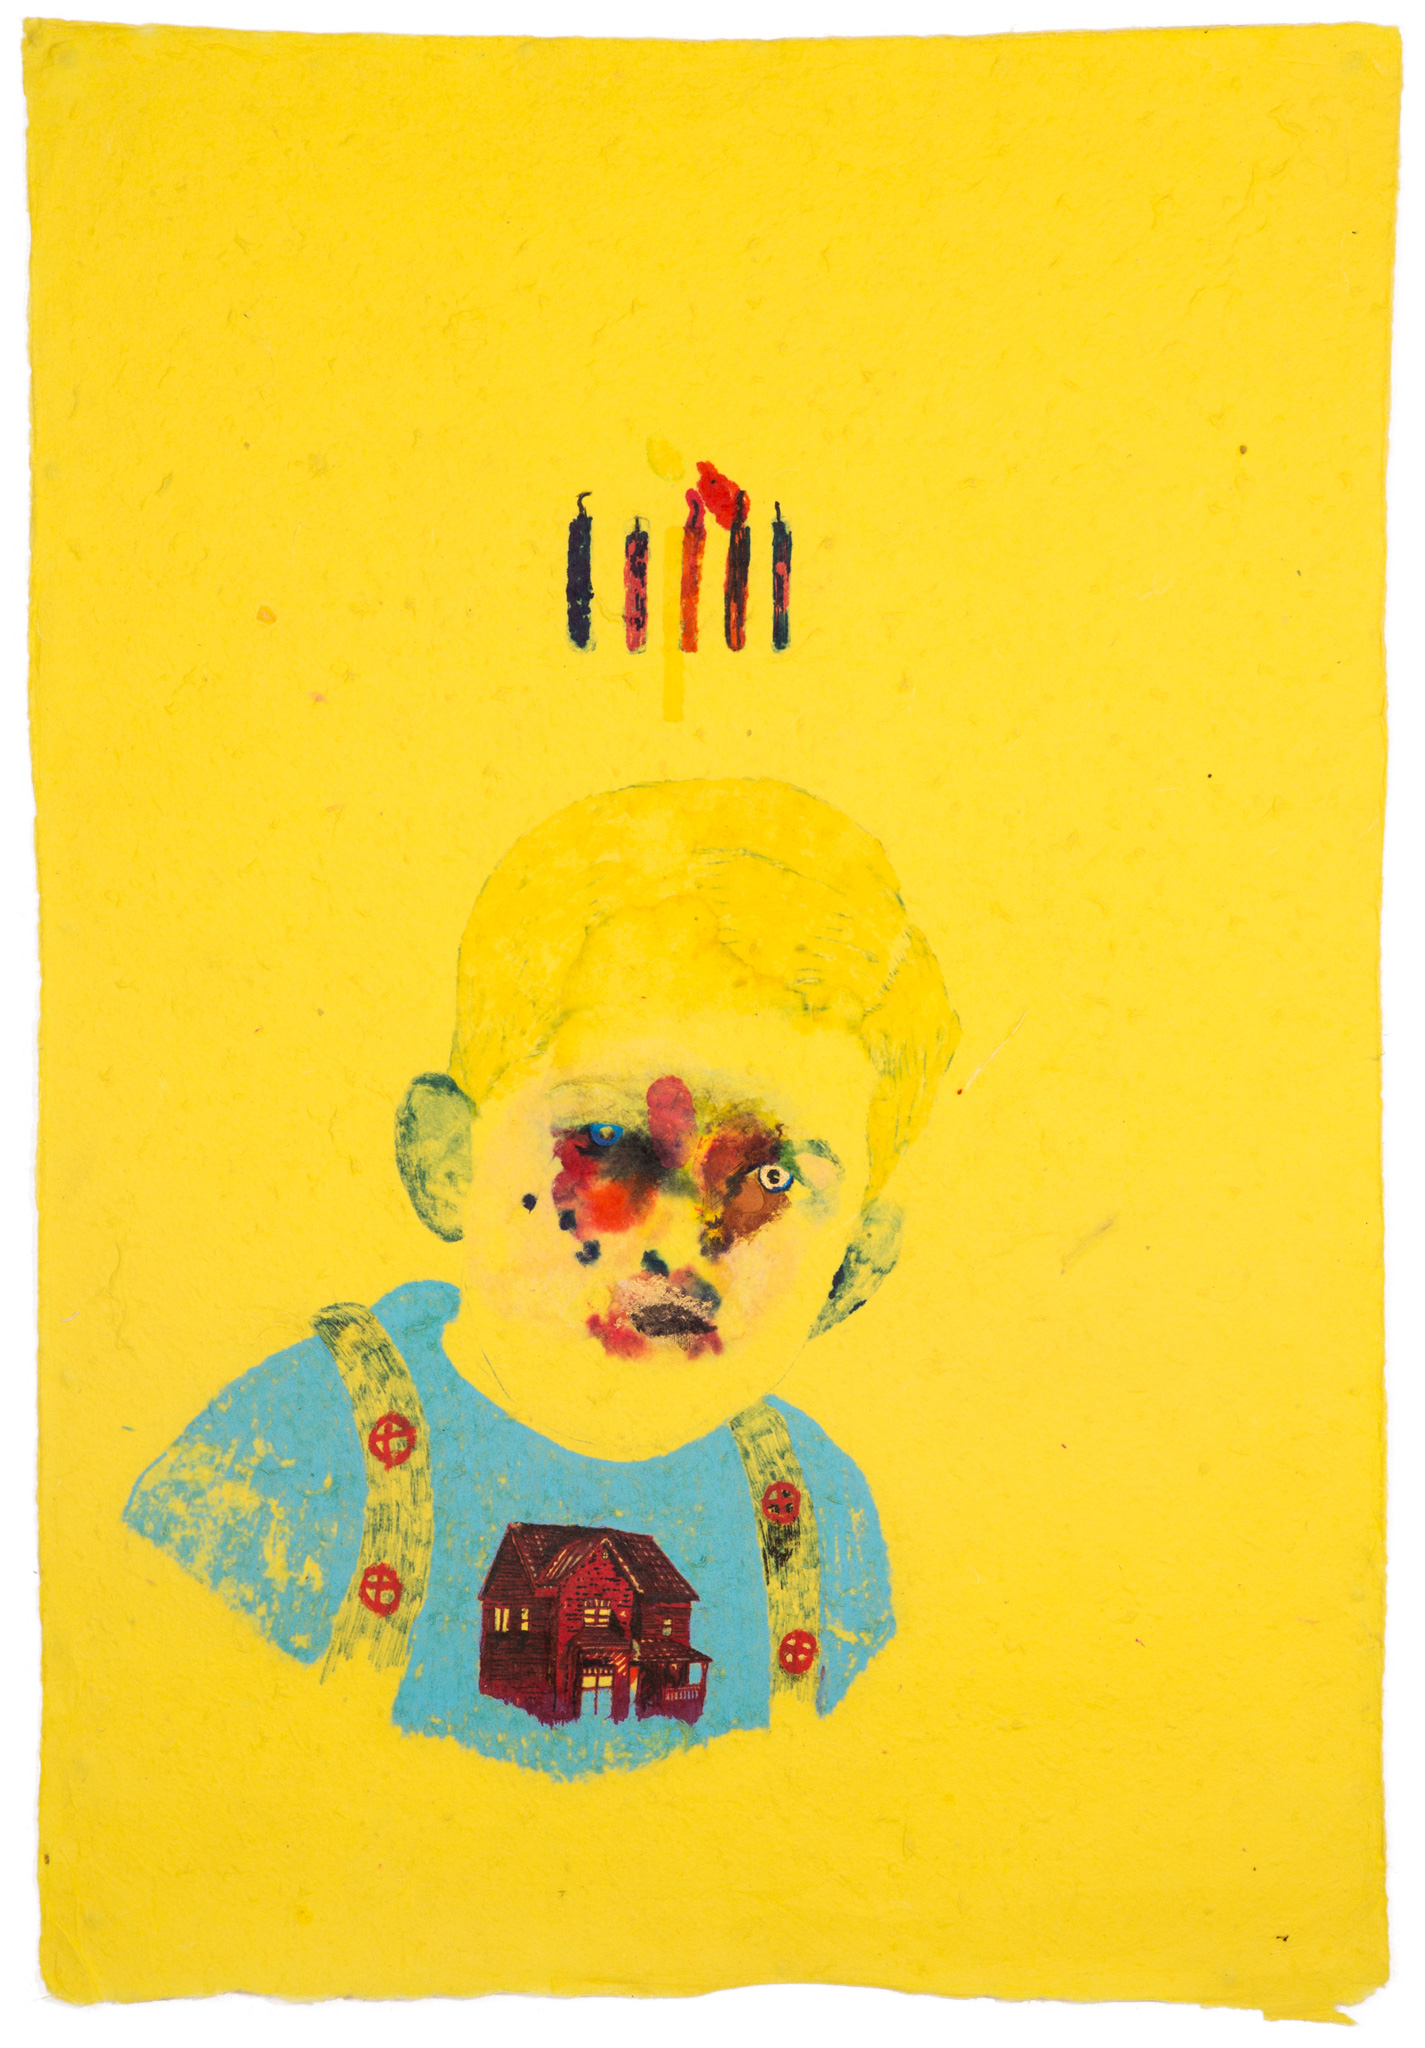 Yoann Estevenin Happy Birthday, 2017 Pastel, watercolor, marker and ballpoint pen on mulberry paper 80 × 55 cm